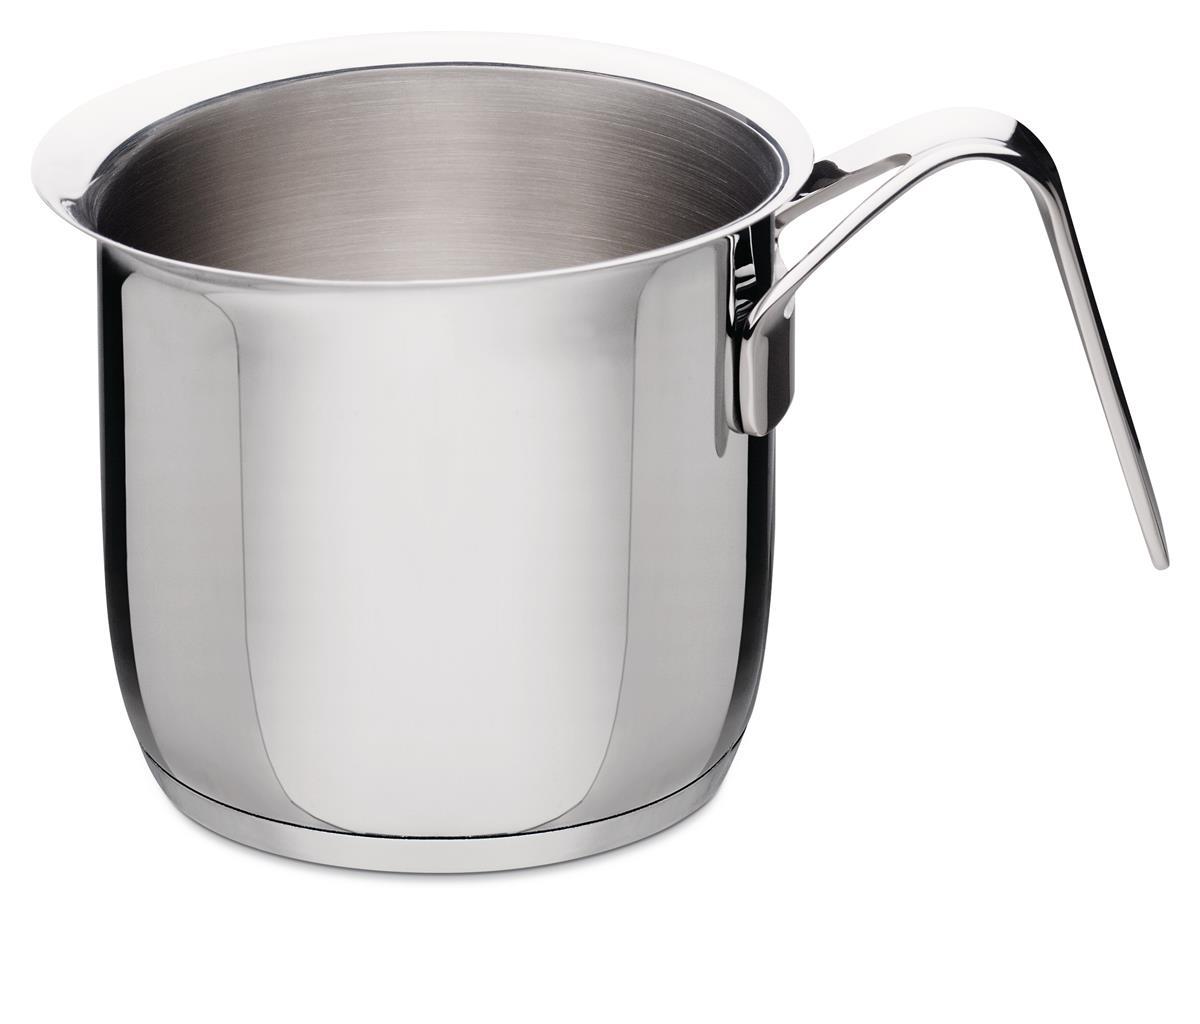 Alessi-Pots&Pans Bollilatte in acciaio inox 18/10 adatto a induzione